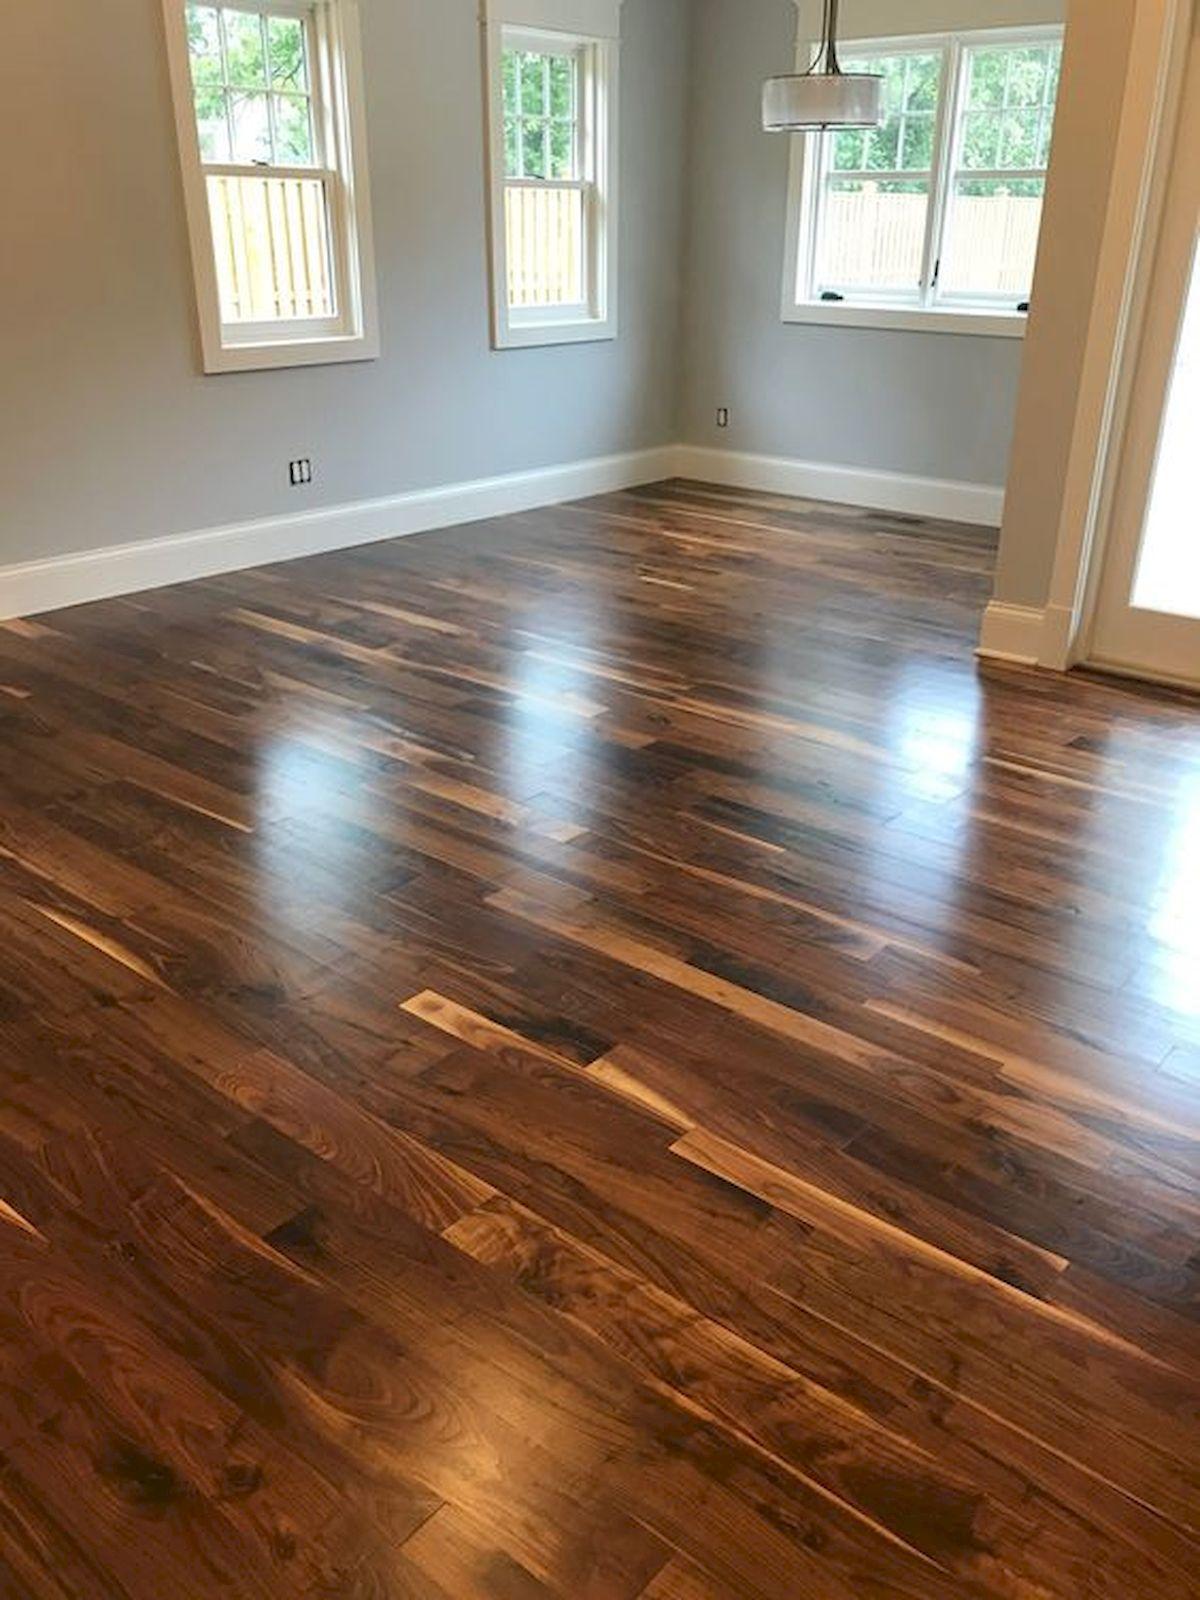 80 Gorgeous Hardwood Floor Ideas for Interior Home (21)